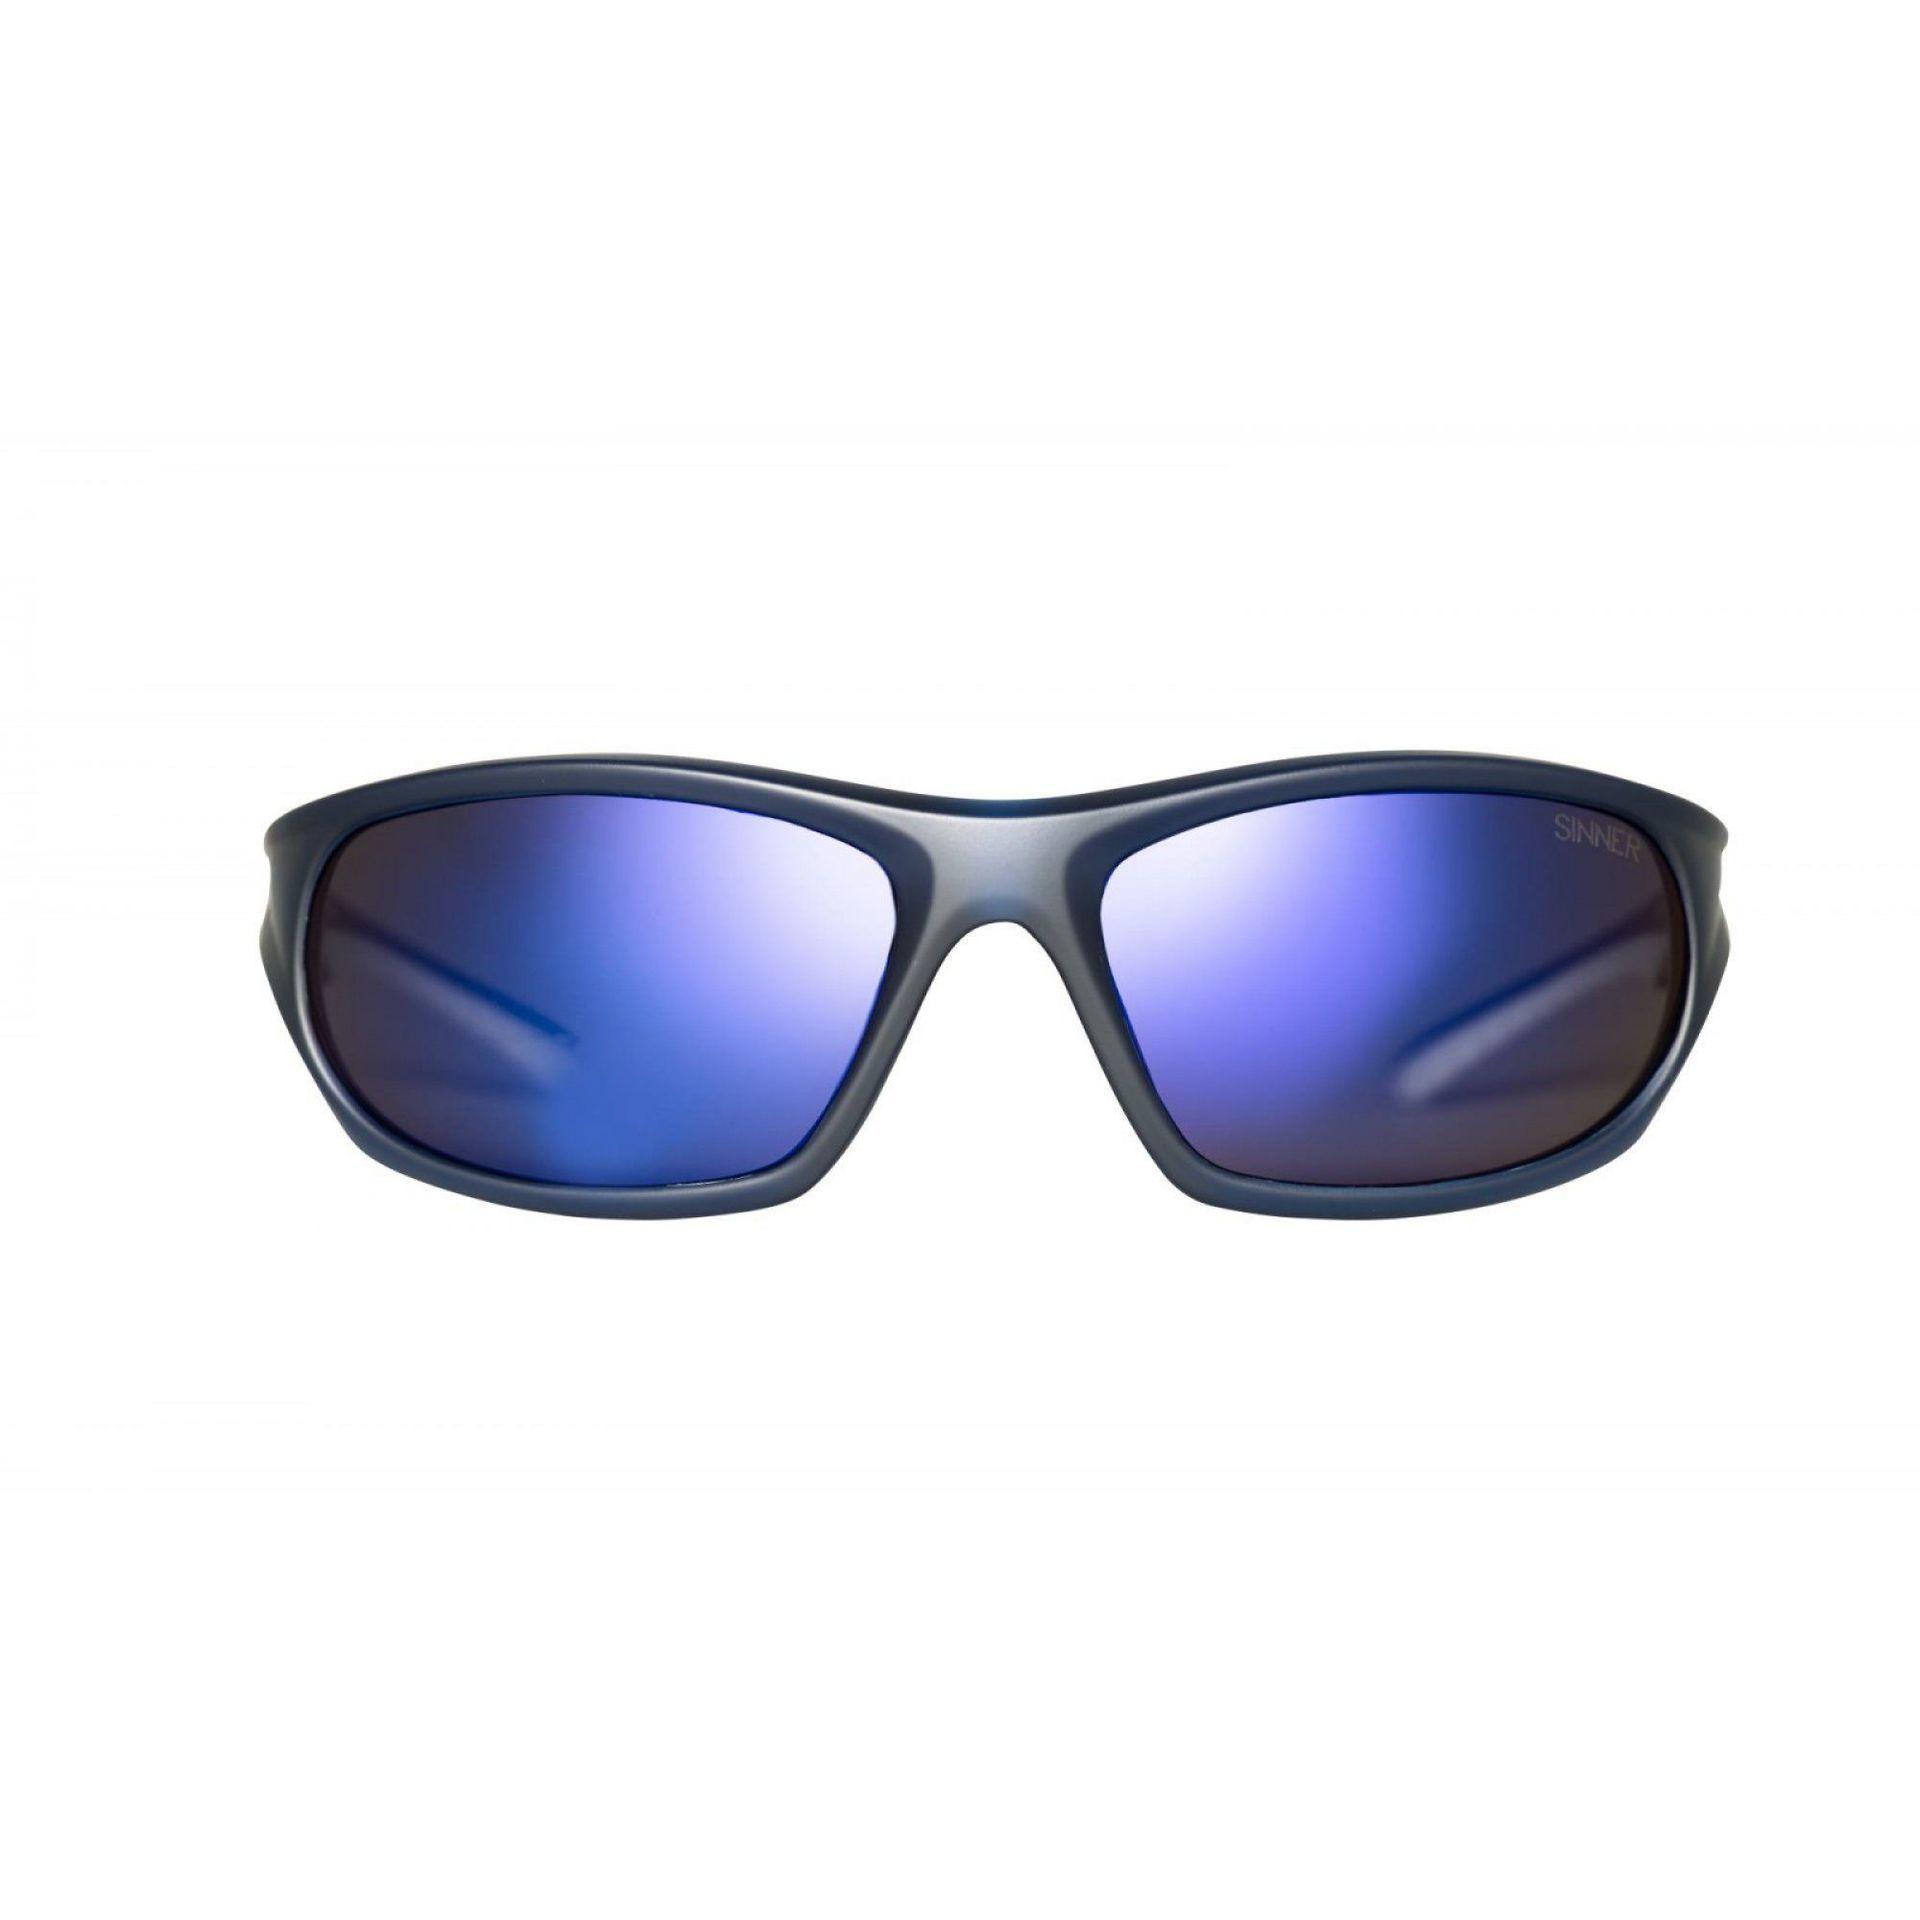 OKULARY SINNER FURY BLUE 2